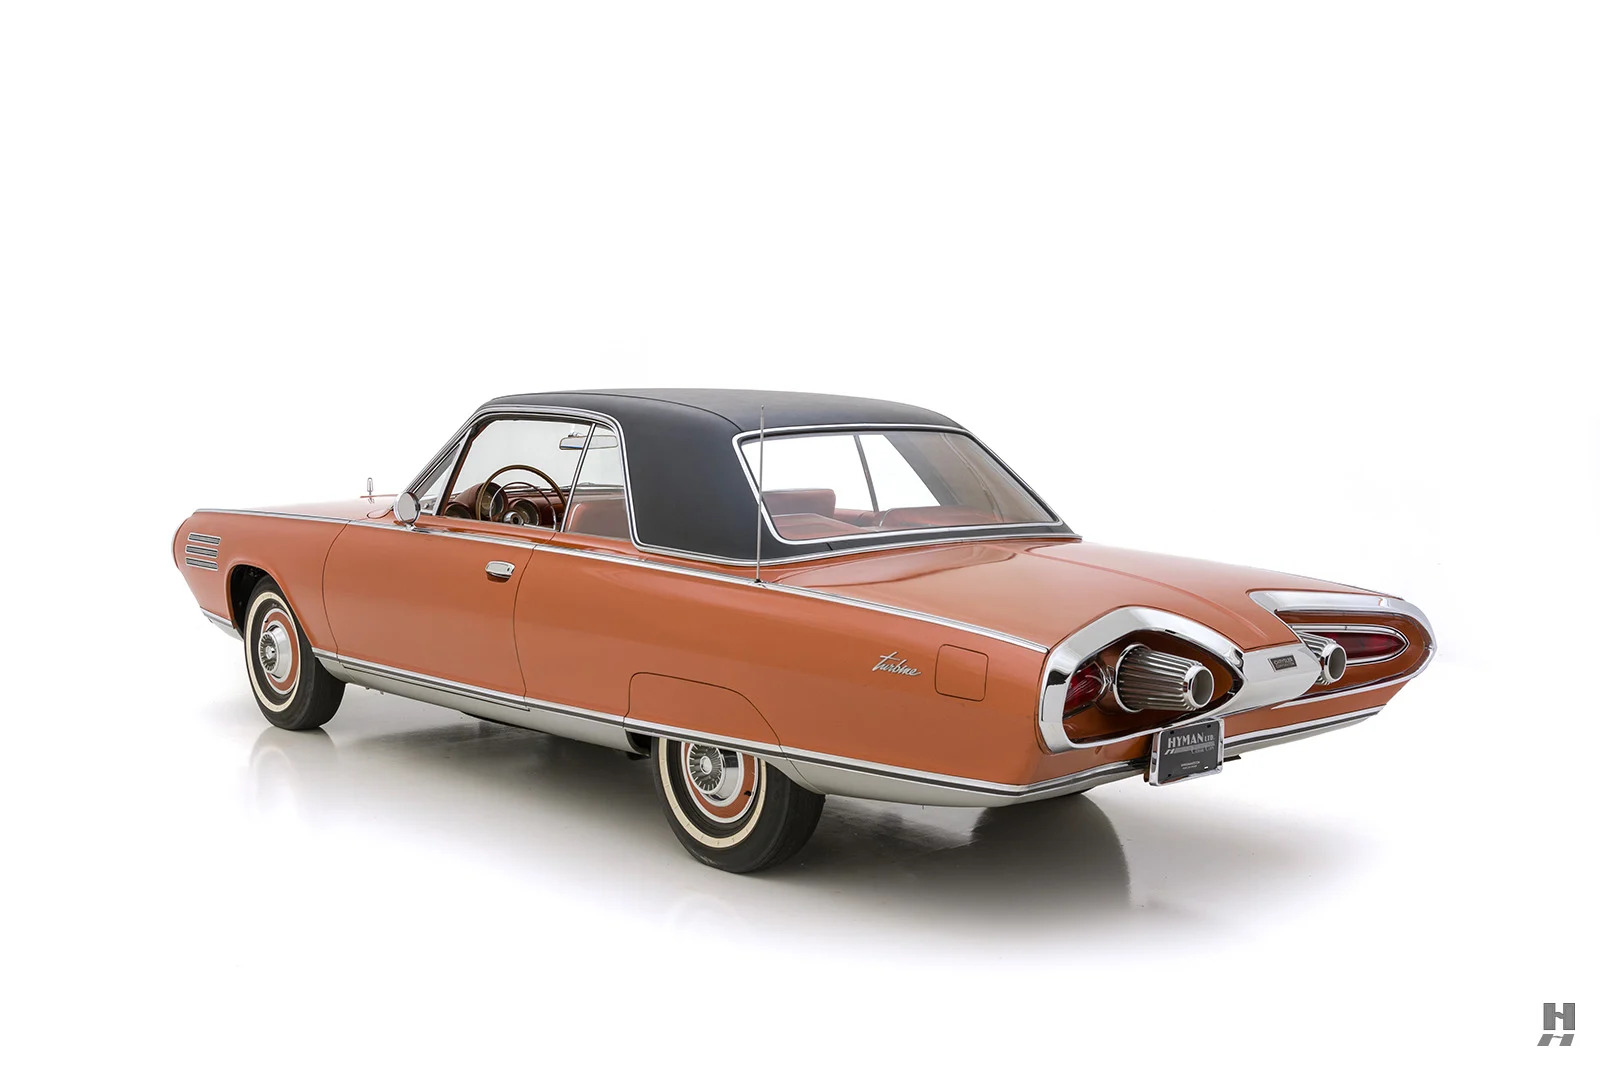 1963 Chrysler Turbine Car rear three-quarter